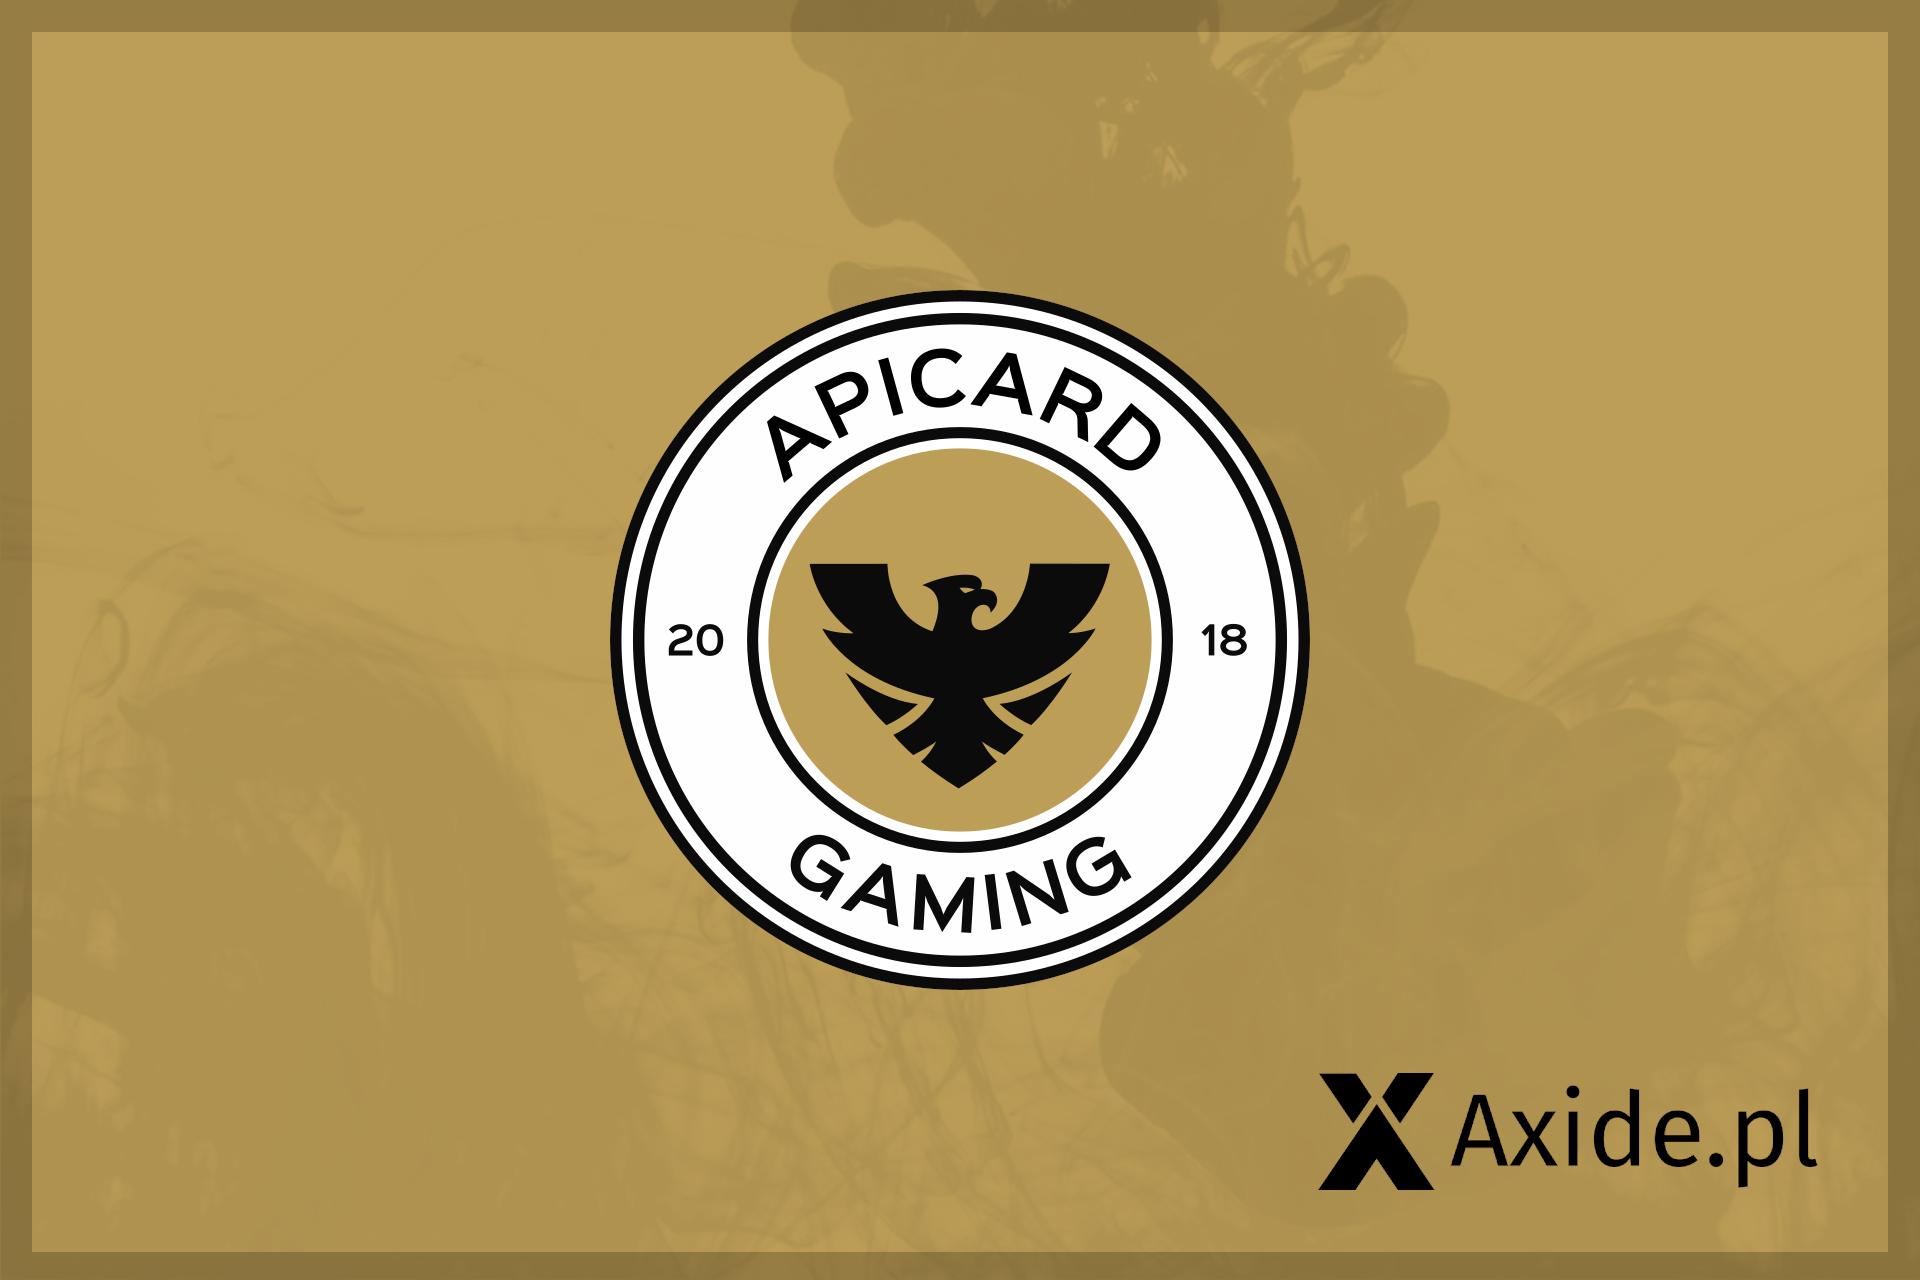 apicard gaming